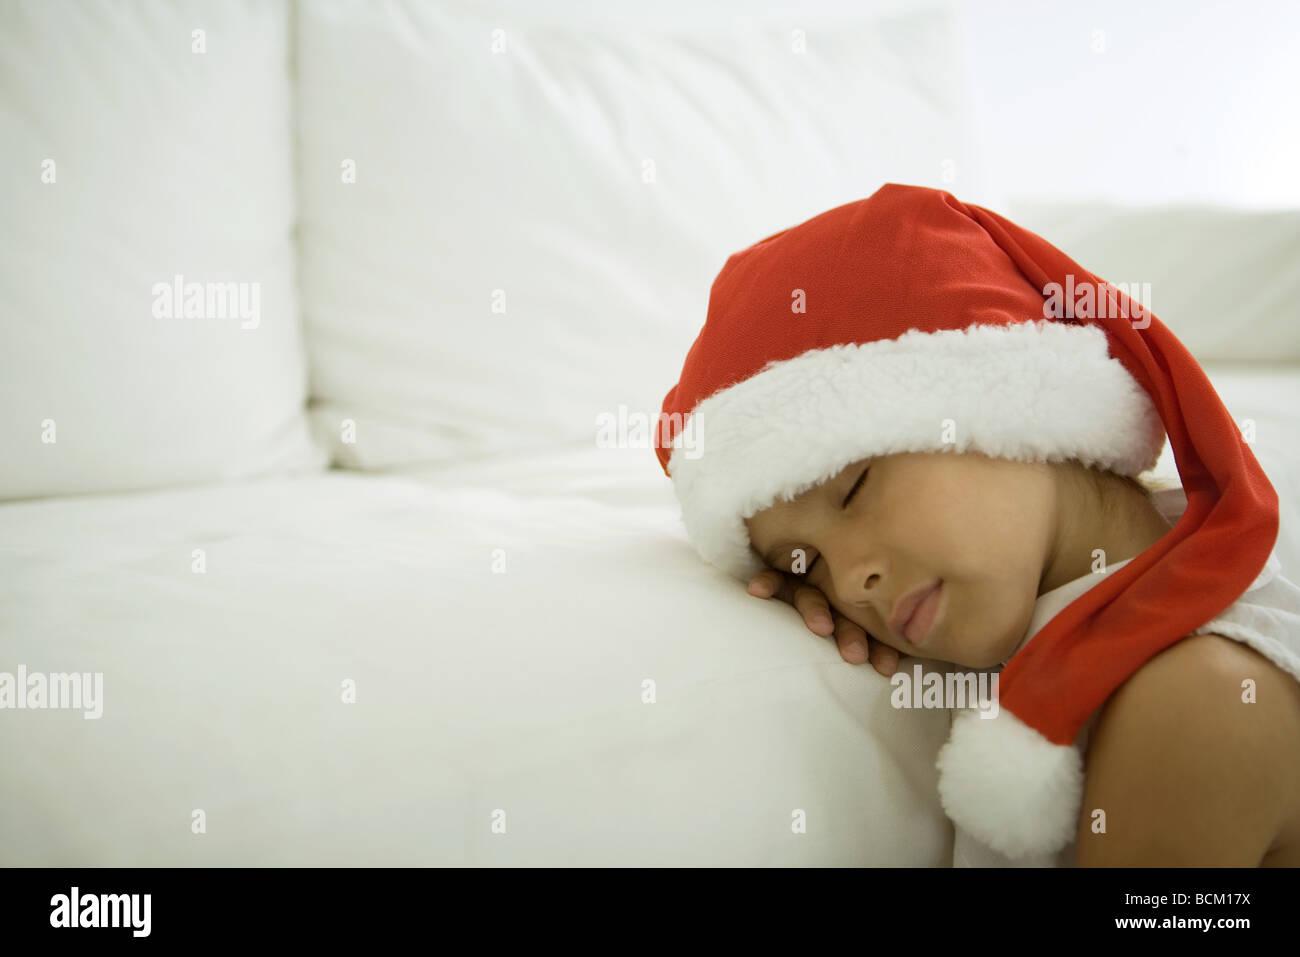 Child sleeping with head on sofa, wearing santa hat, close-up - Stock Image